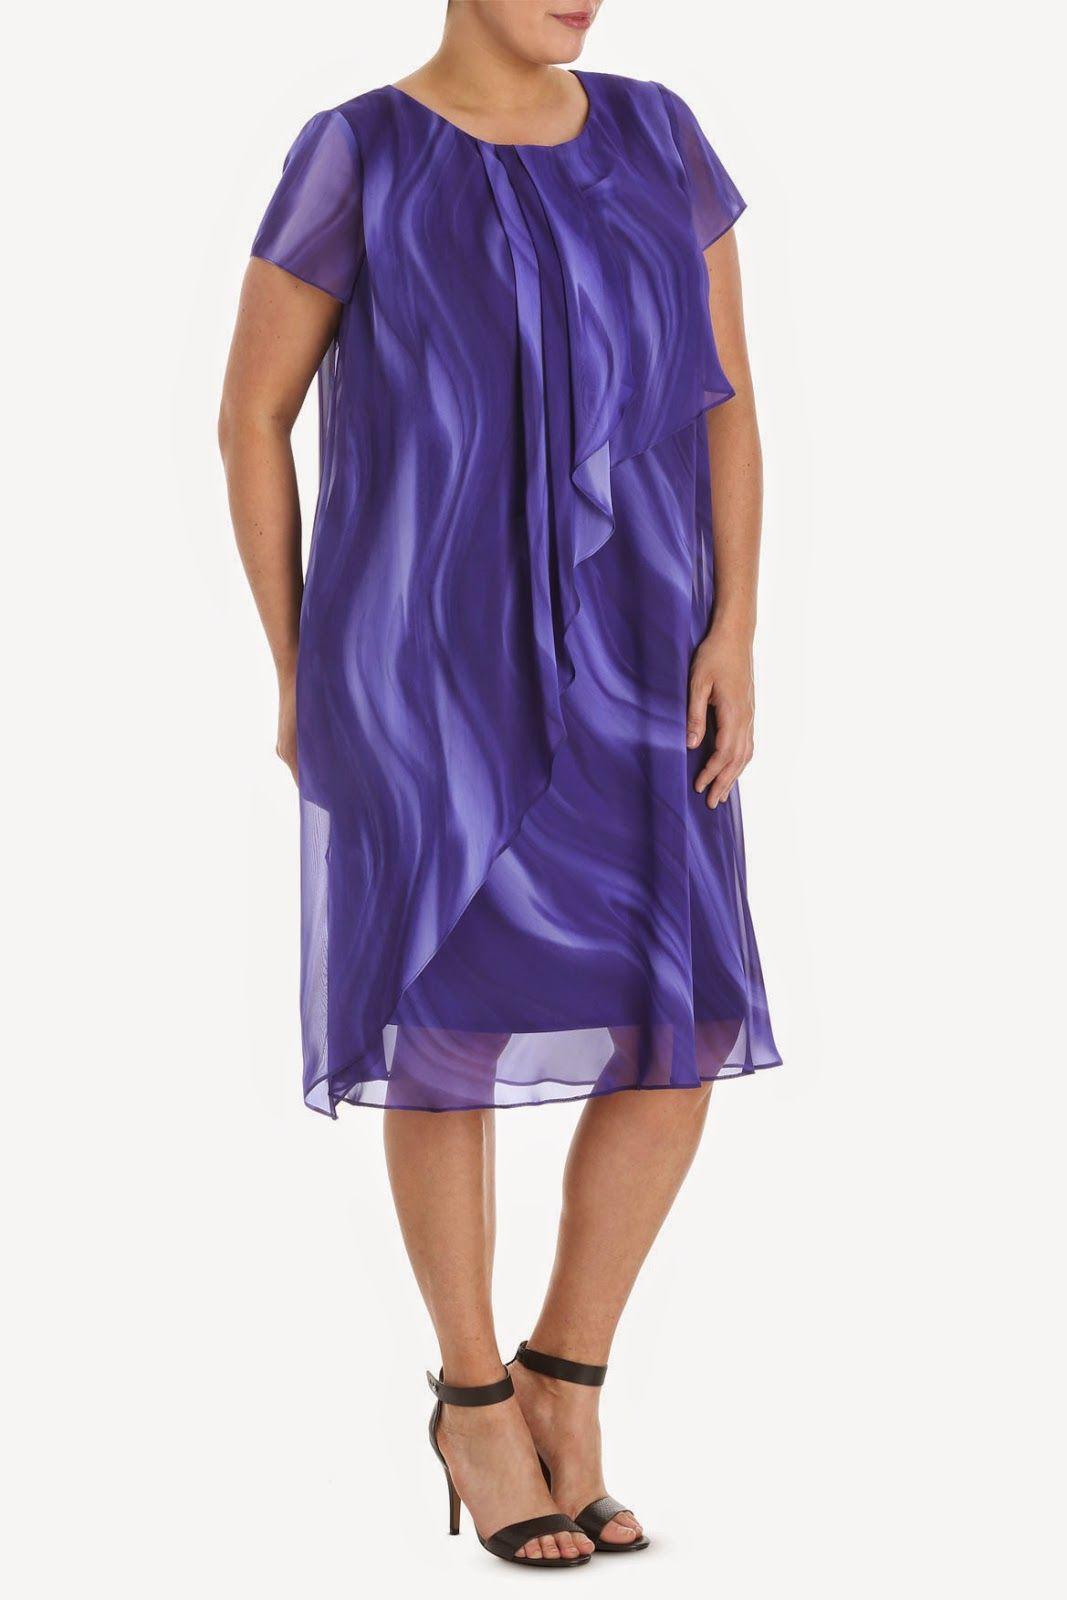 plus size dress #myer   Plus Size Dresses / Büyük Beden Elbiseler ...